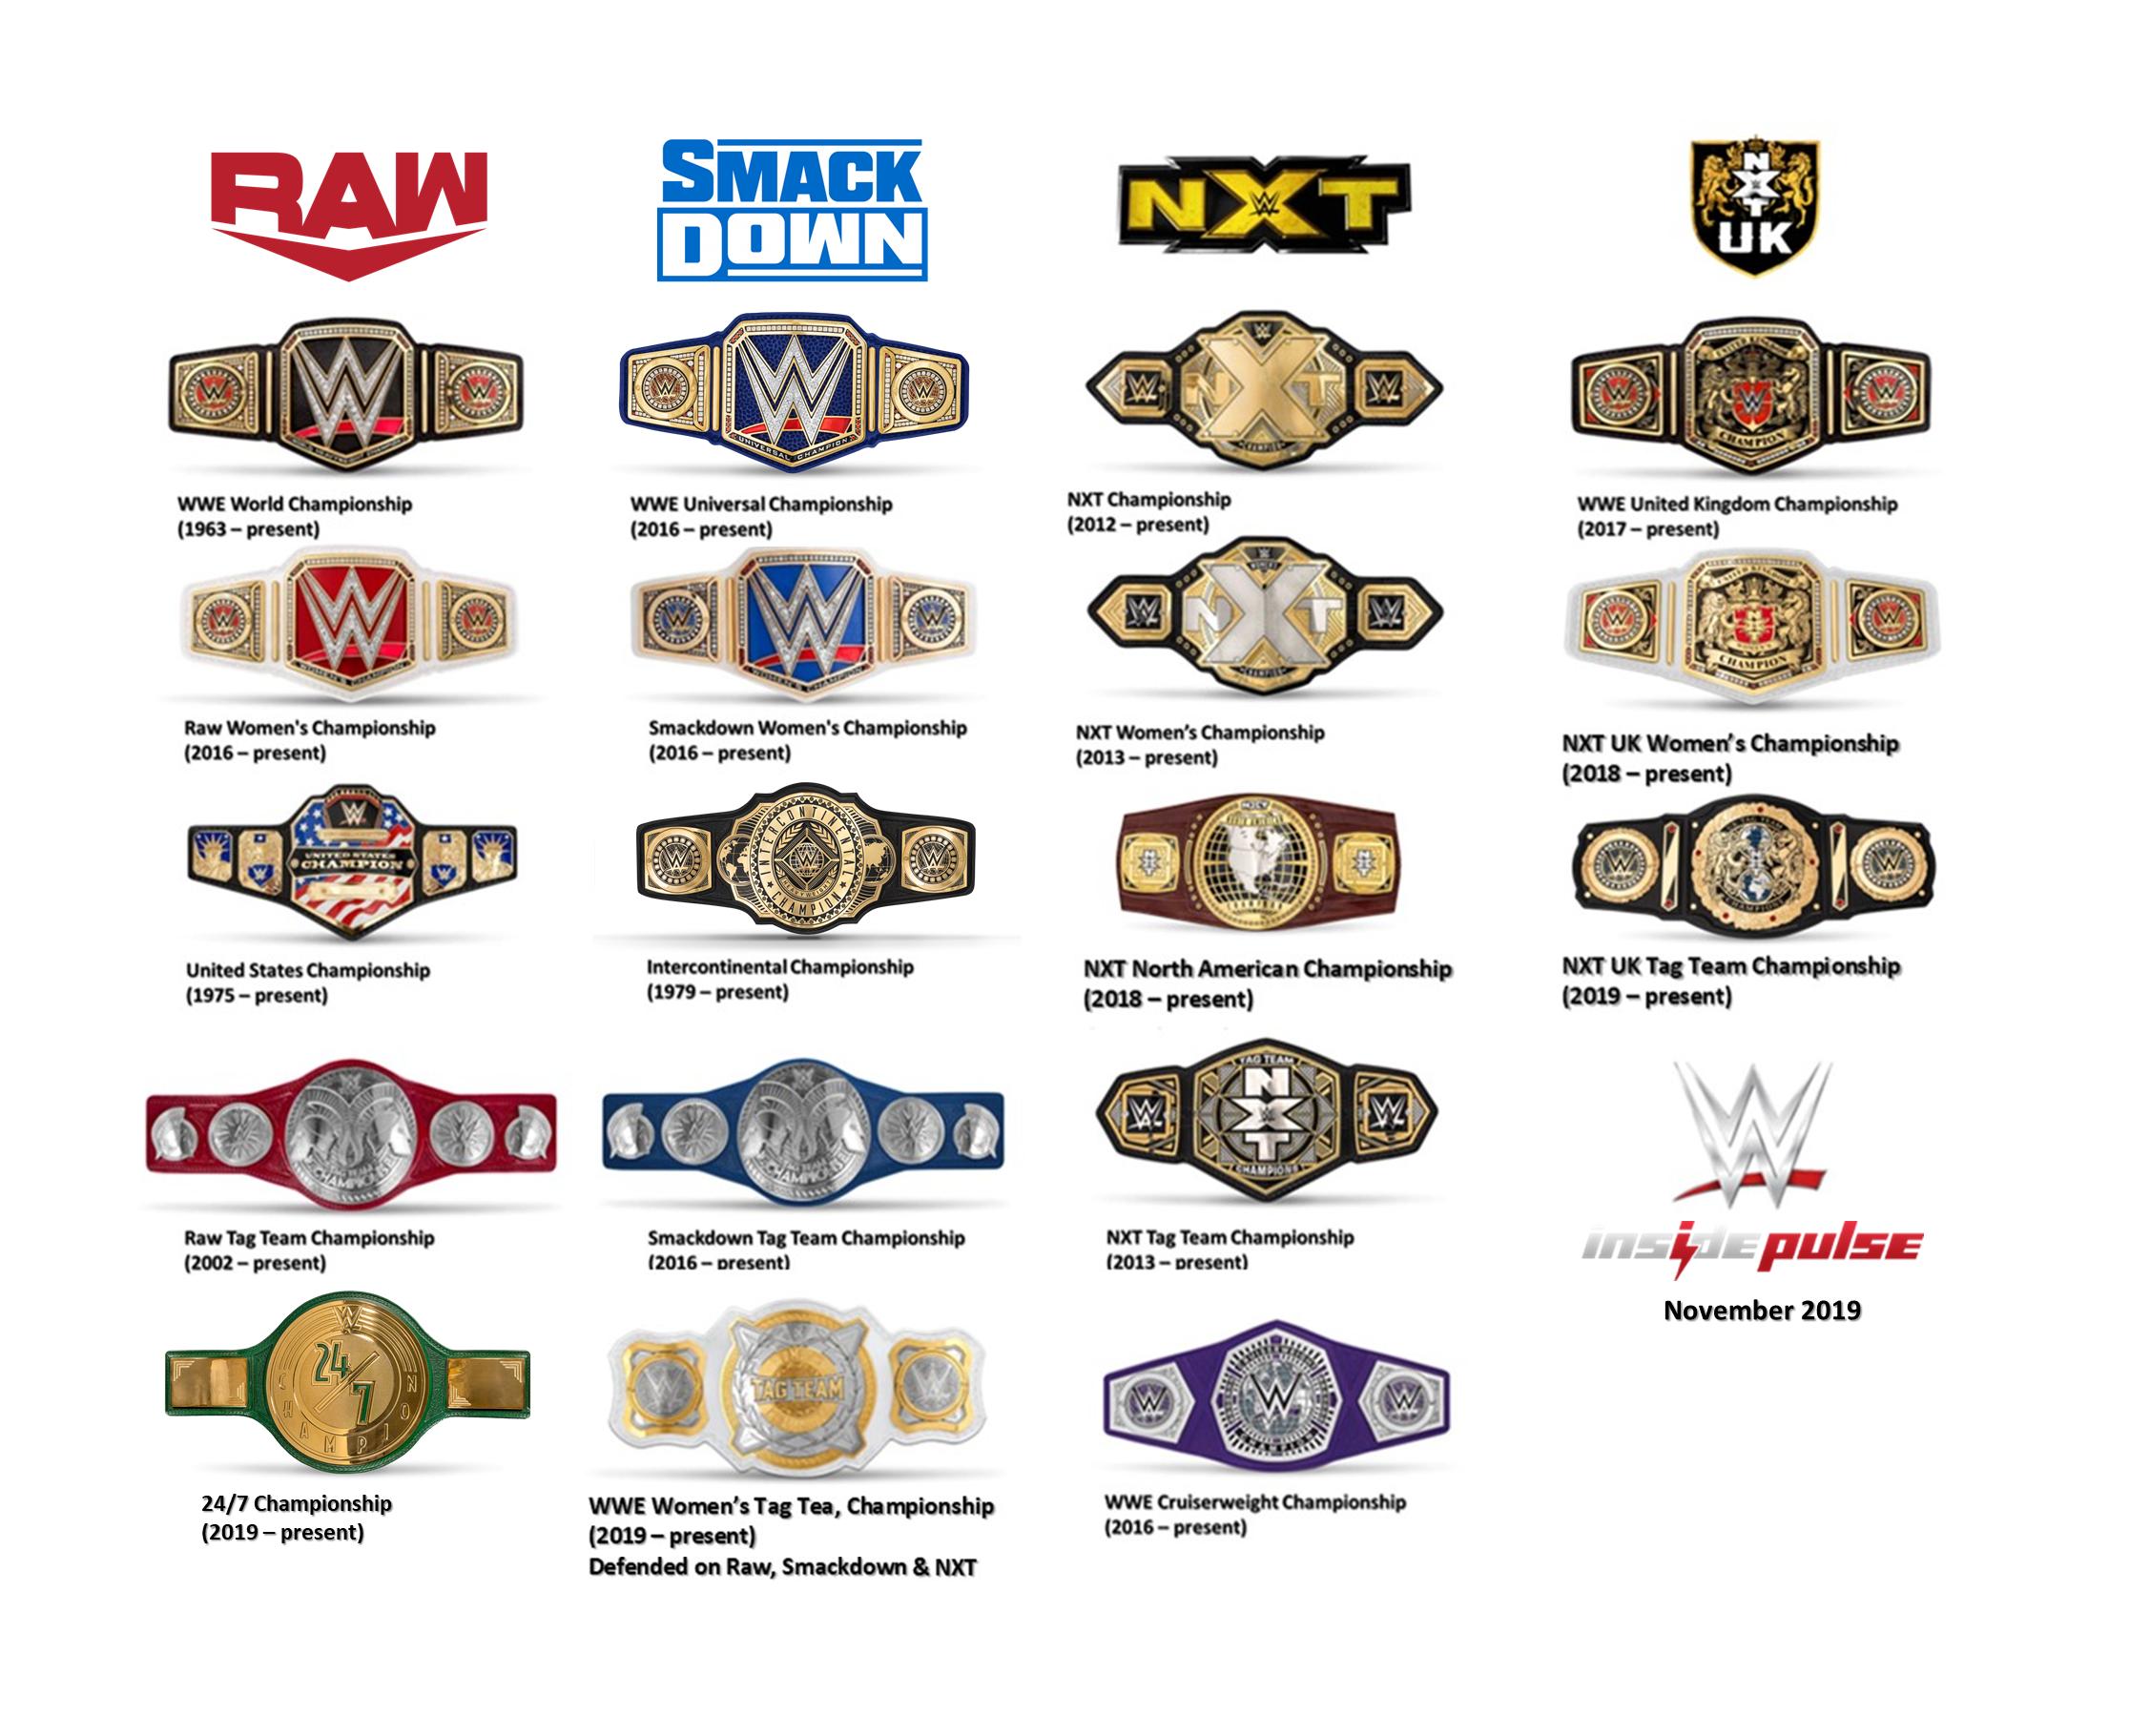 Pin By Douglas Mellott On Wrestling Championship Belts Nxt Women S Championship Pro Wrestler Rich Family